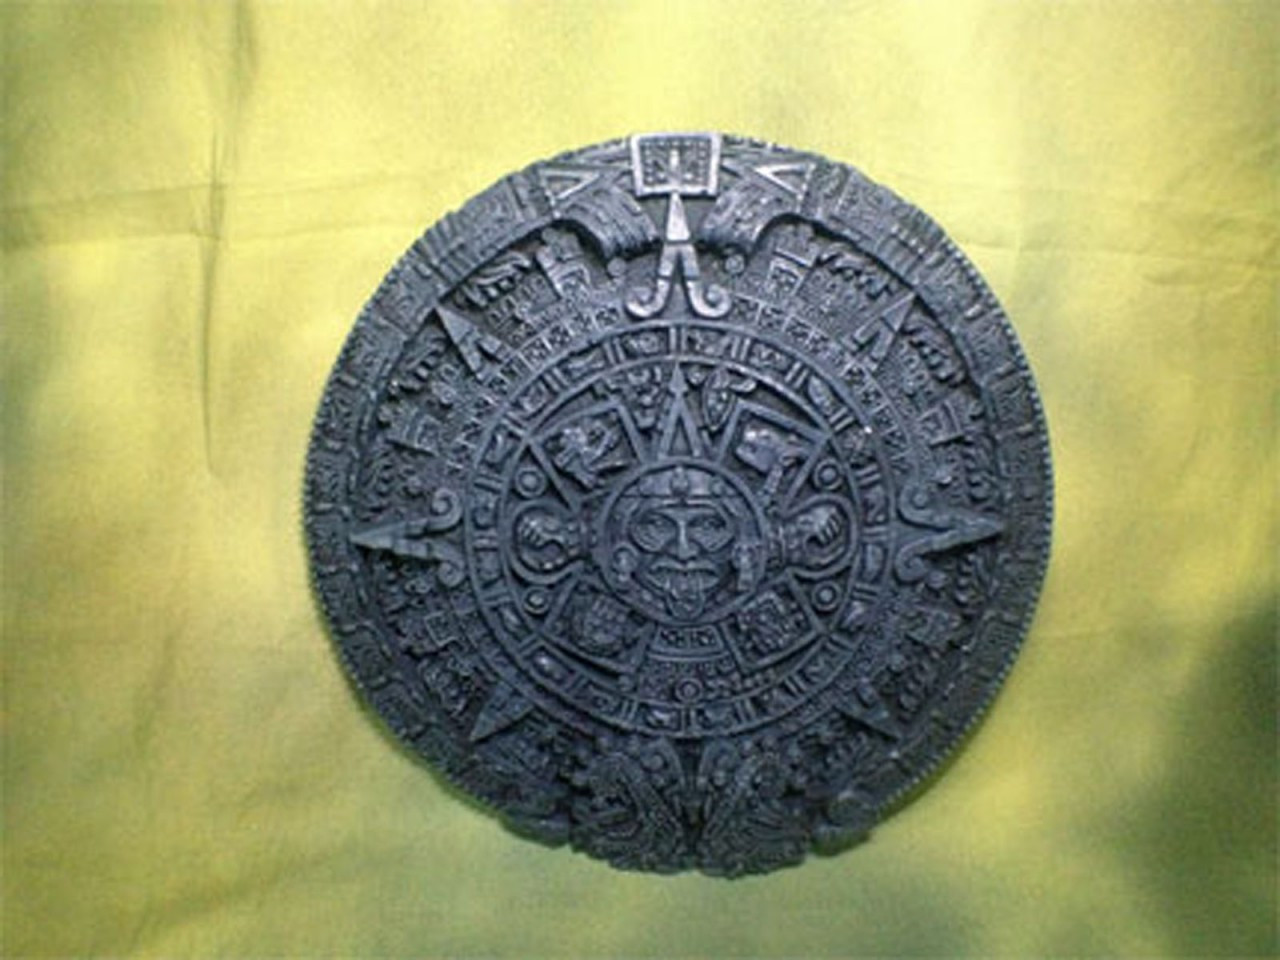 Ancient Aztec, Mayan and Inca Calender, Wall Hanging - Reel Art